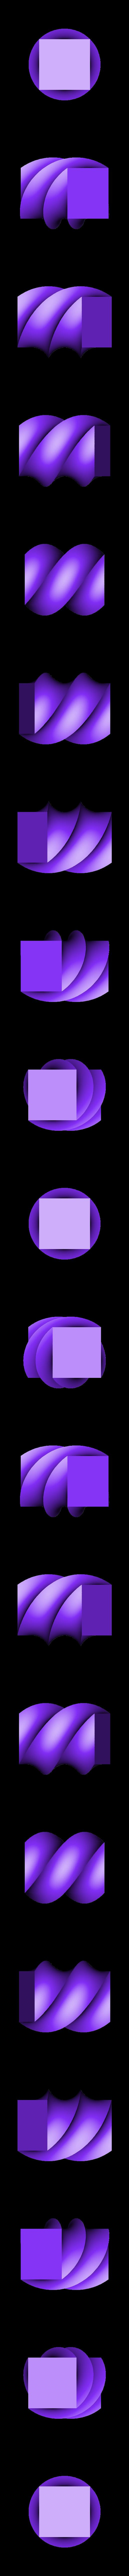 Simple_Twisted_Vase_1.STL Download free STL file Simple Twisted Vase 1 • 3D printing model, David_Mussaffi